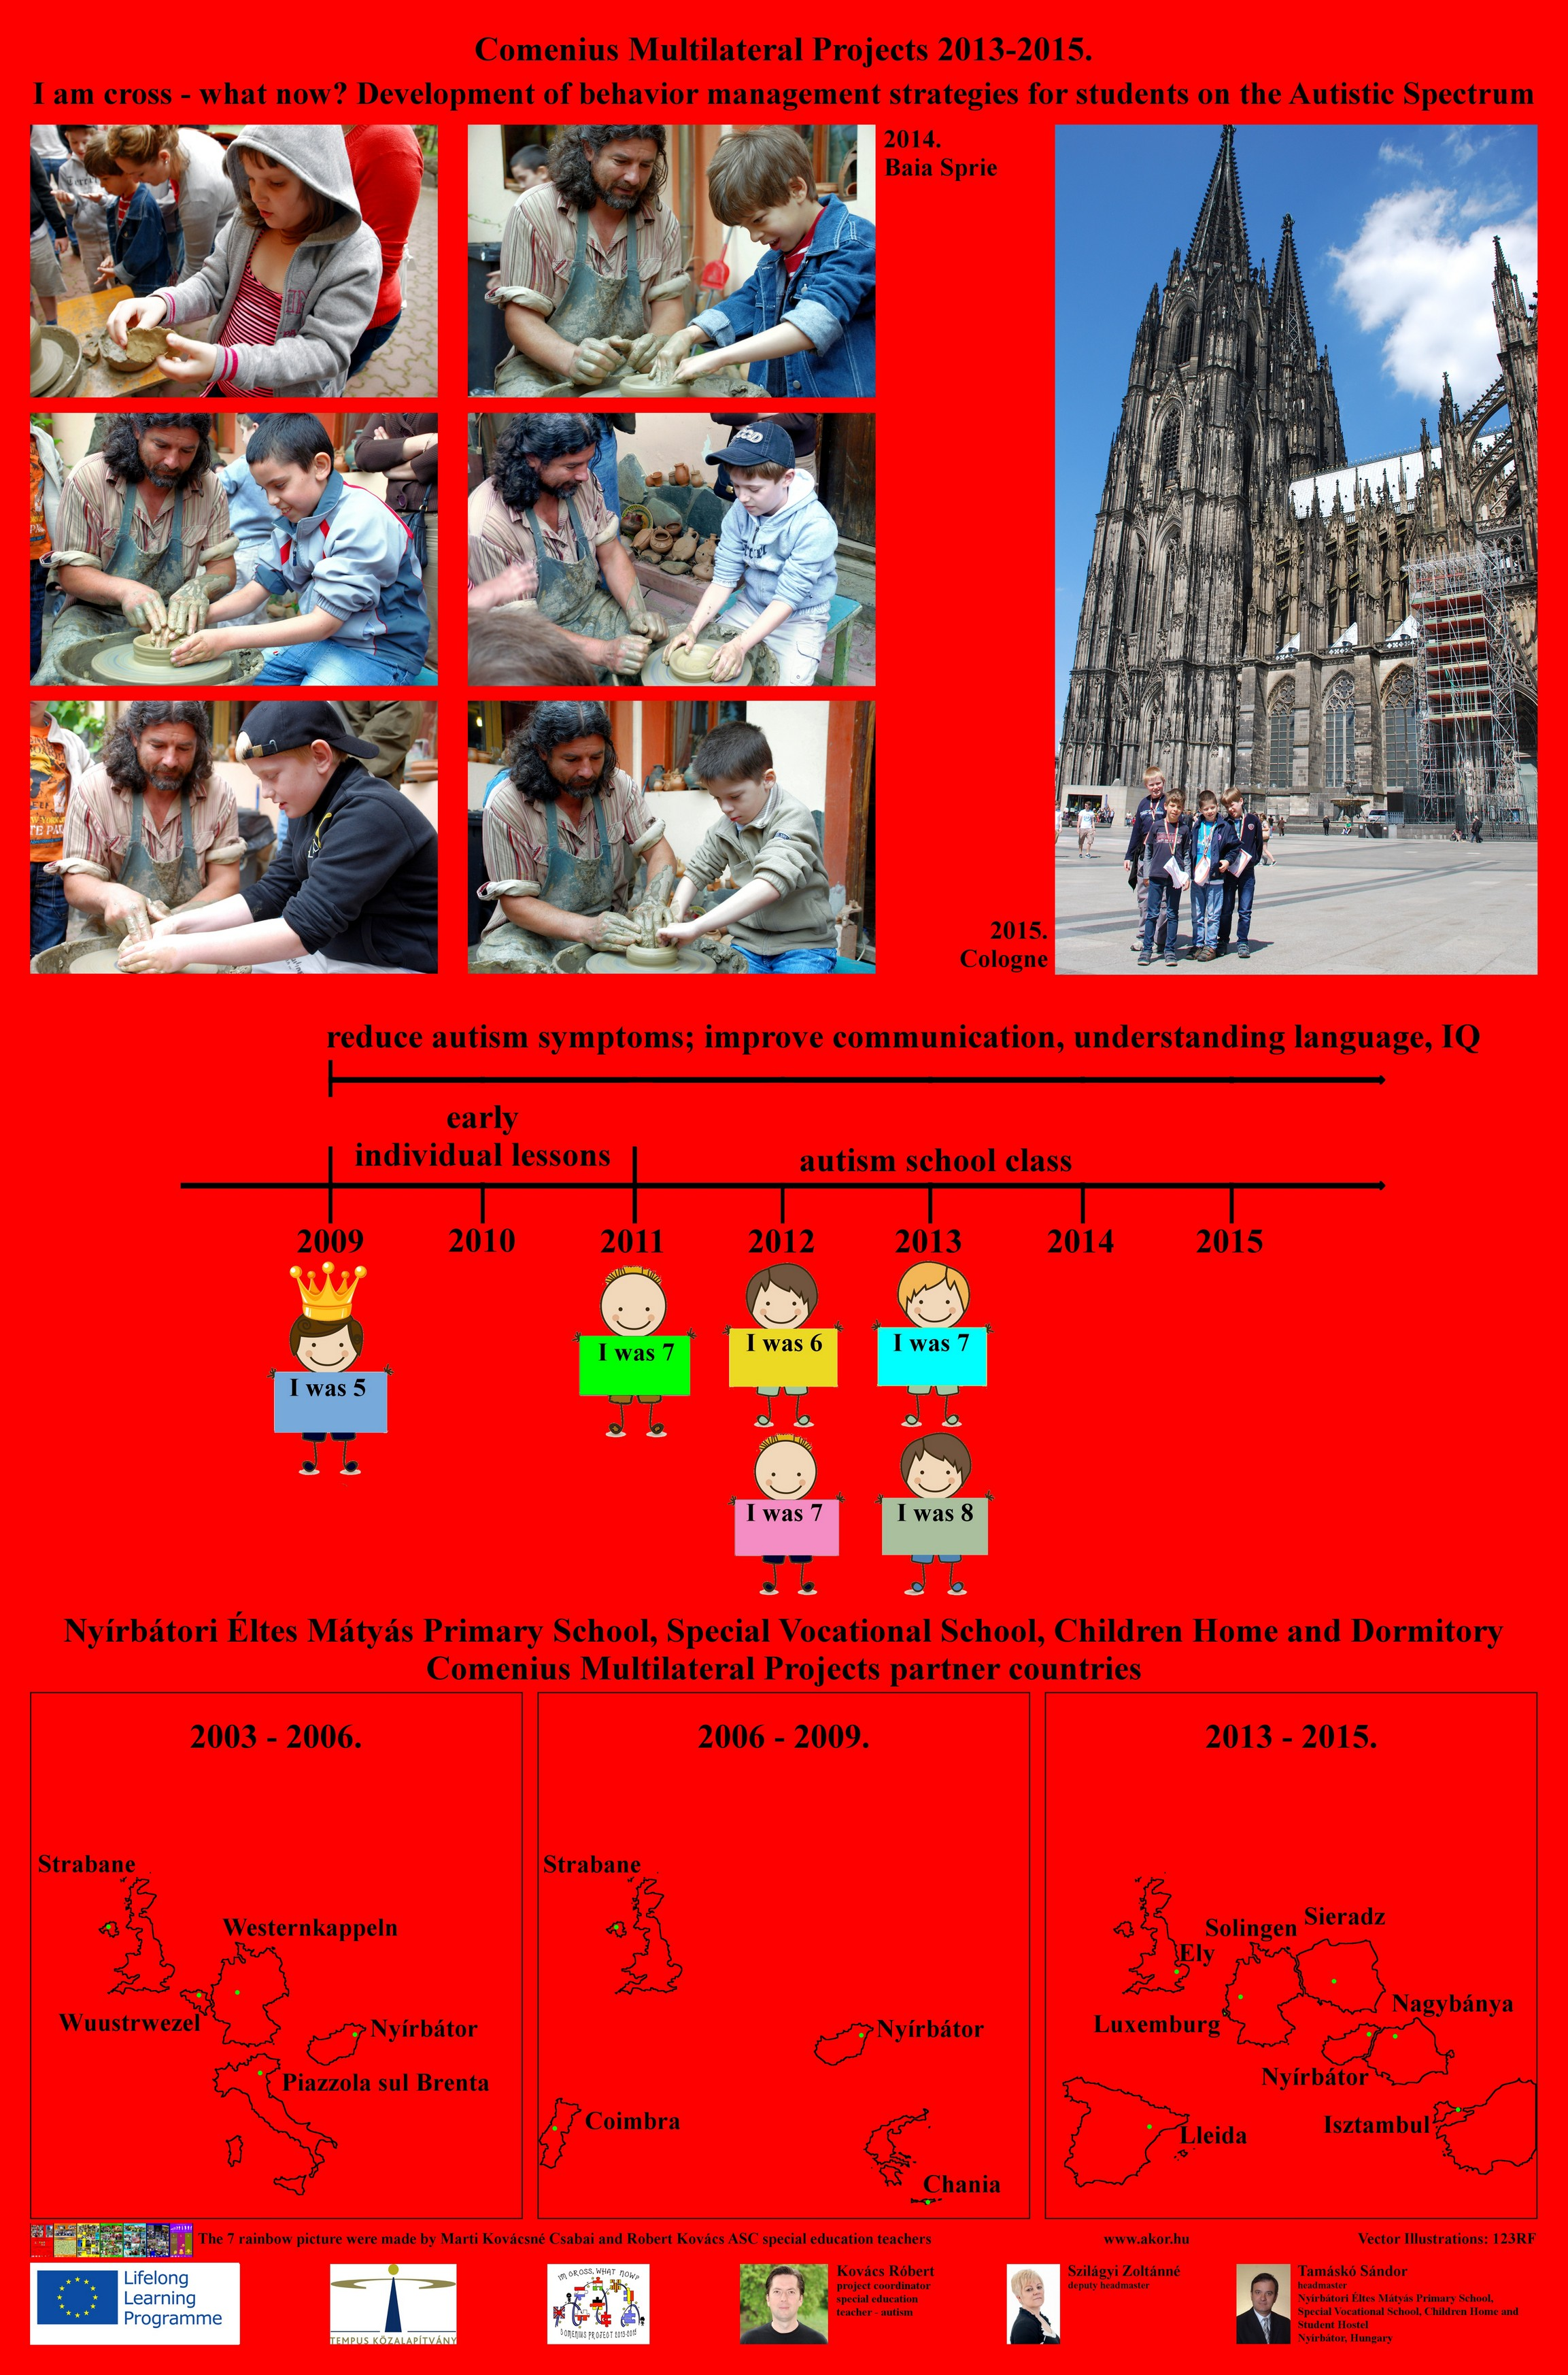 Autism - Comenius project 1. picture